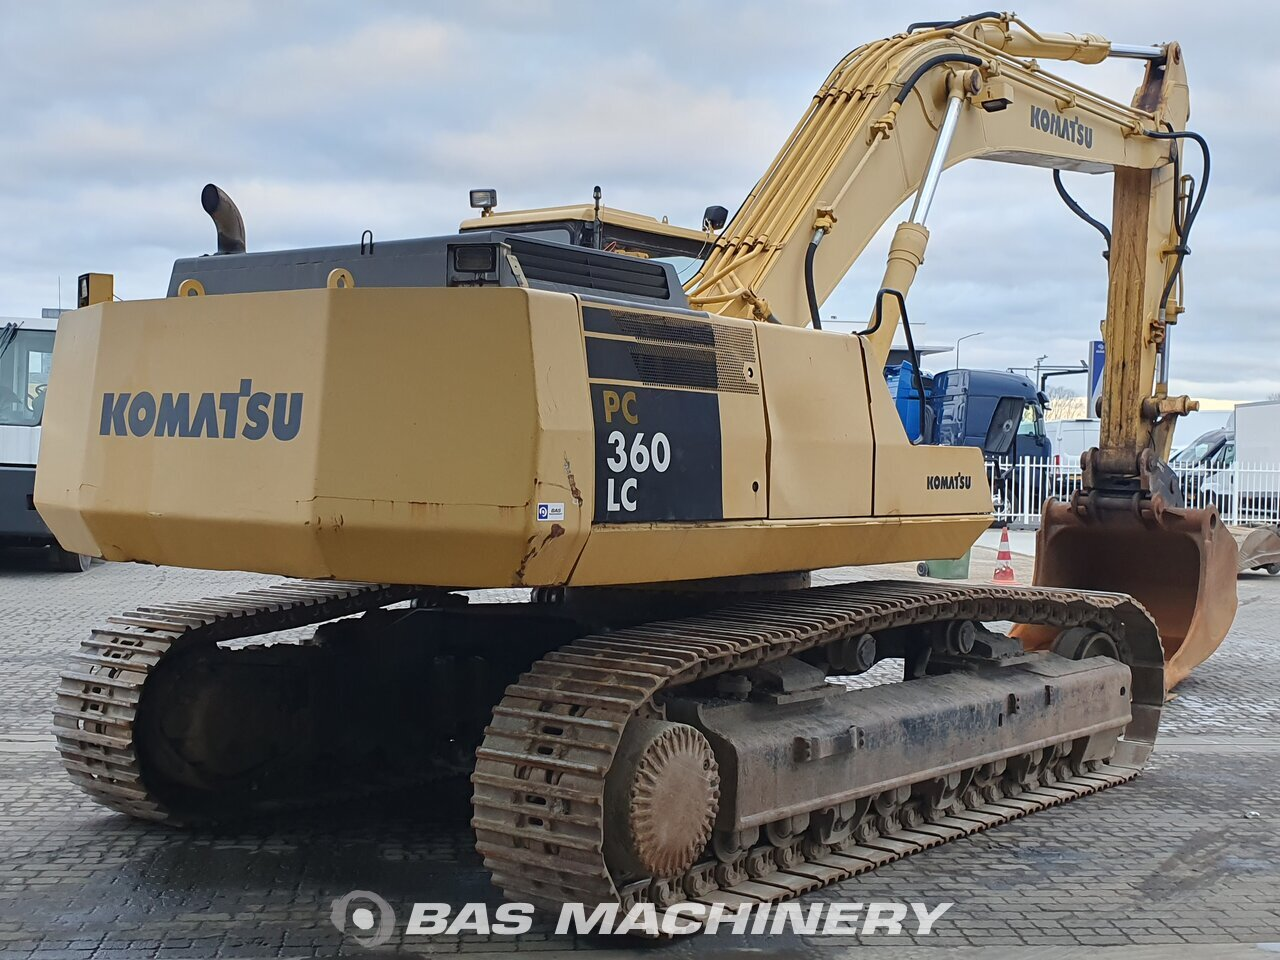 Komatsu PC360 LC 1993 Track excavator - BAS Machinery